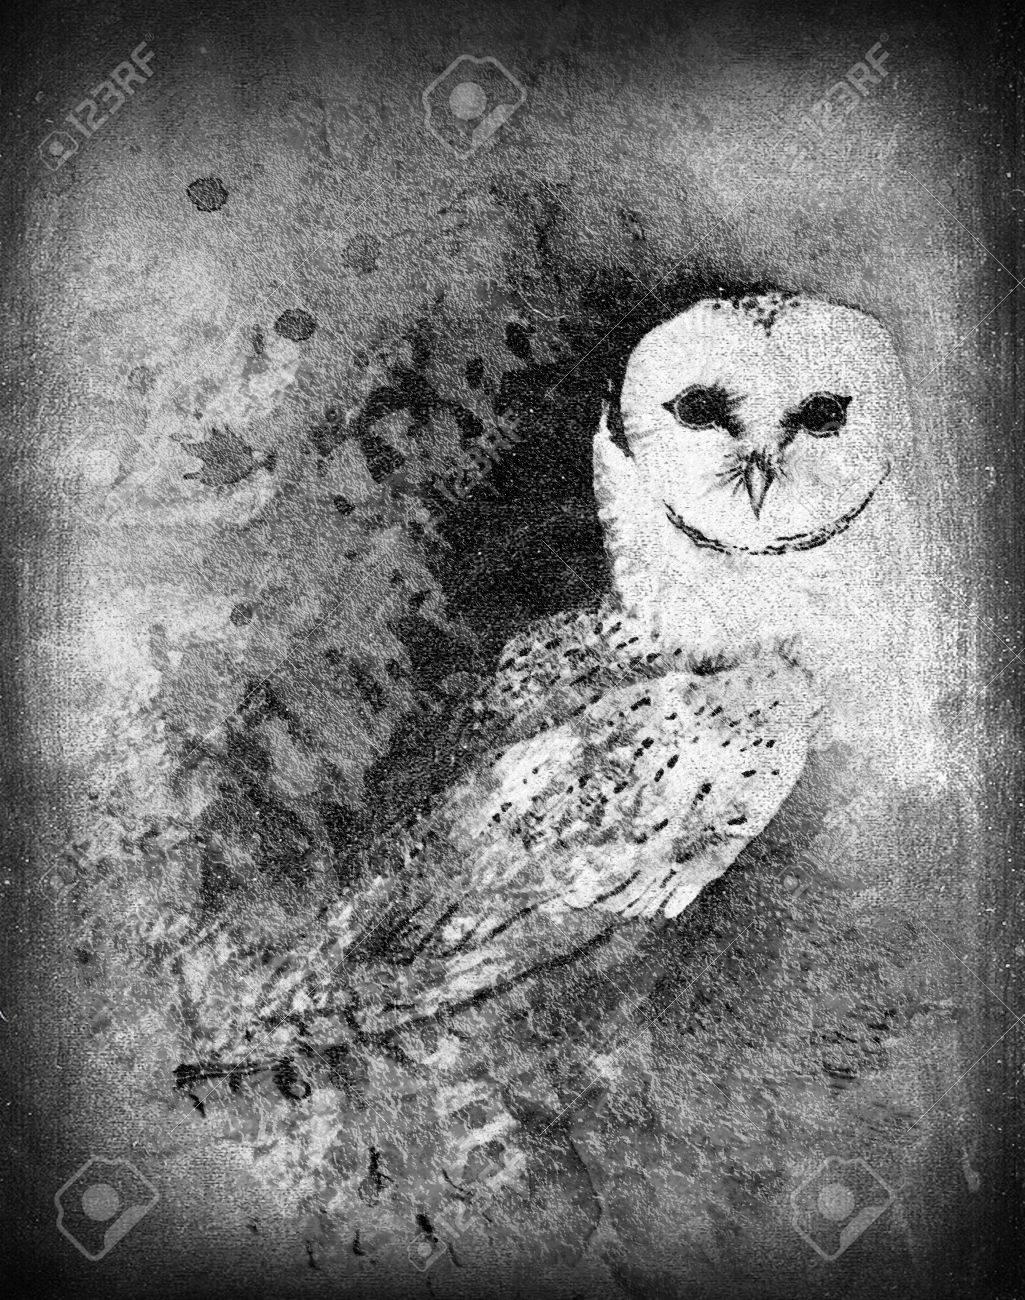 Barn owl illustration black and white sort of chalkboard style stock illustration